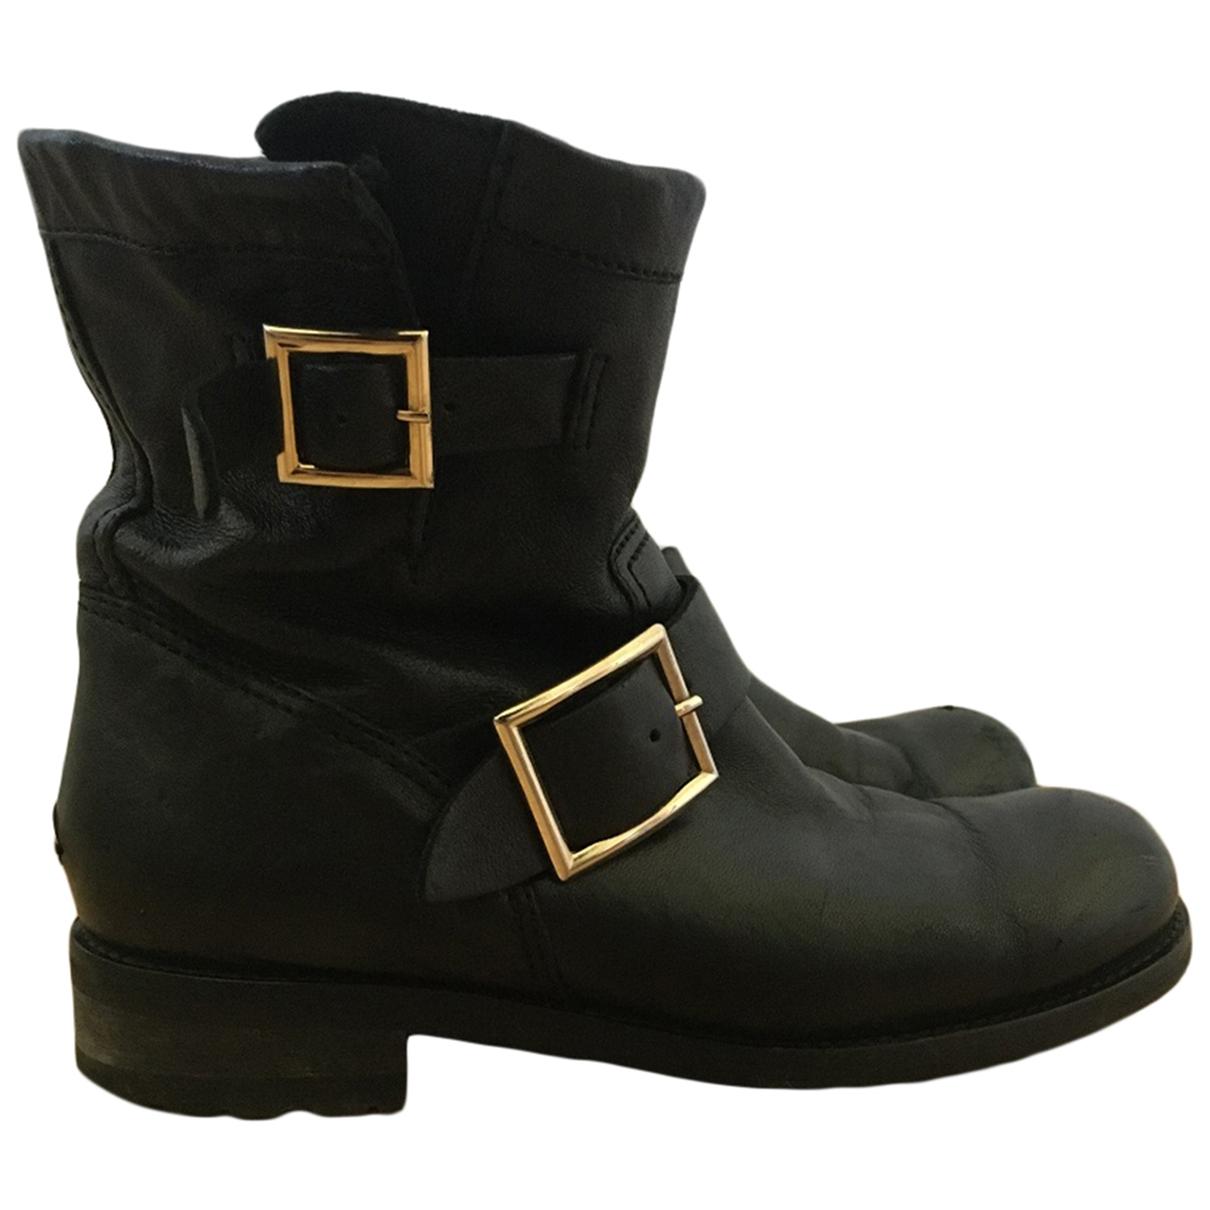 Jimmy Choo \N Black Leather Boots for Women 36 EU